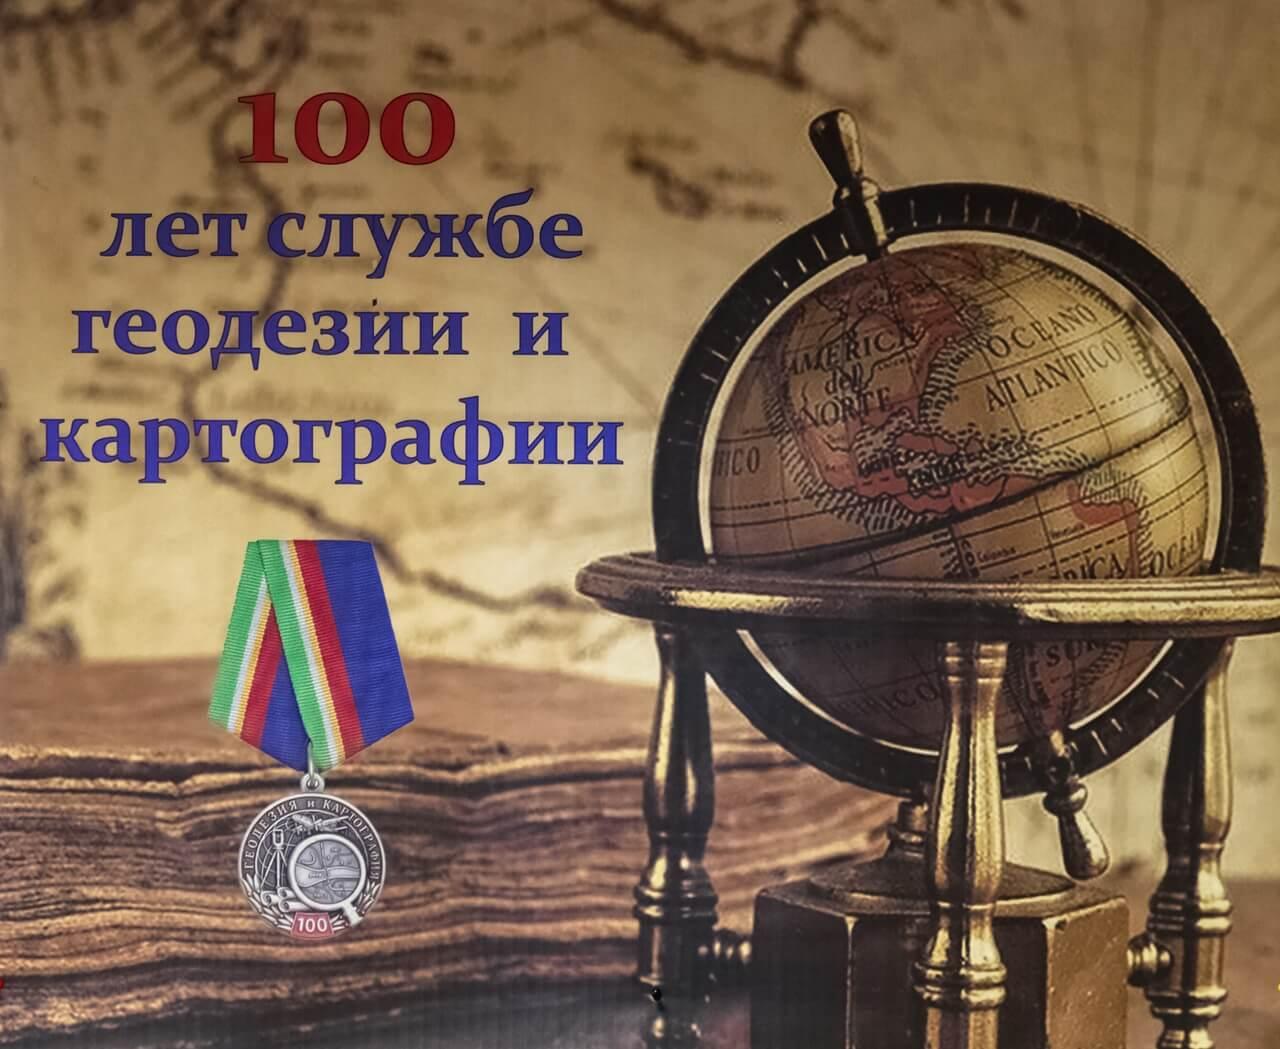 100 лет службе геодезии и картографии